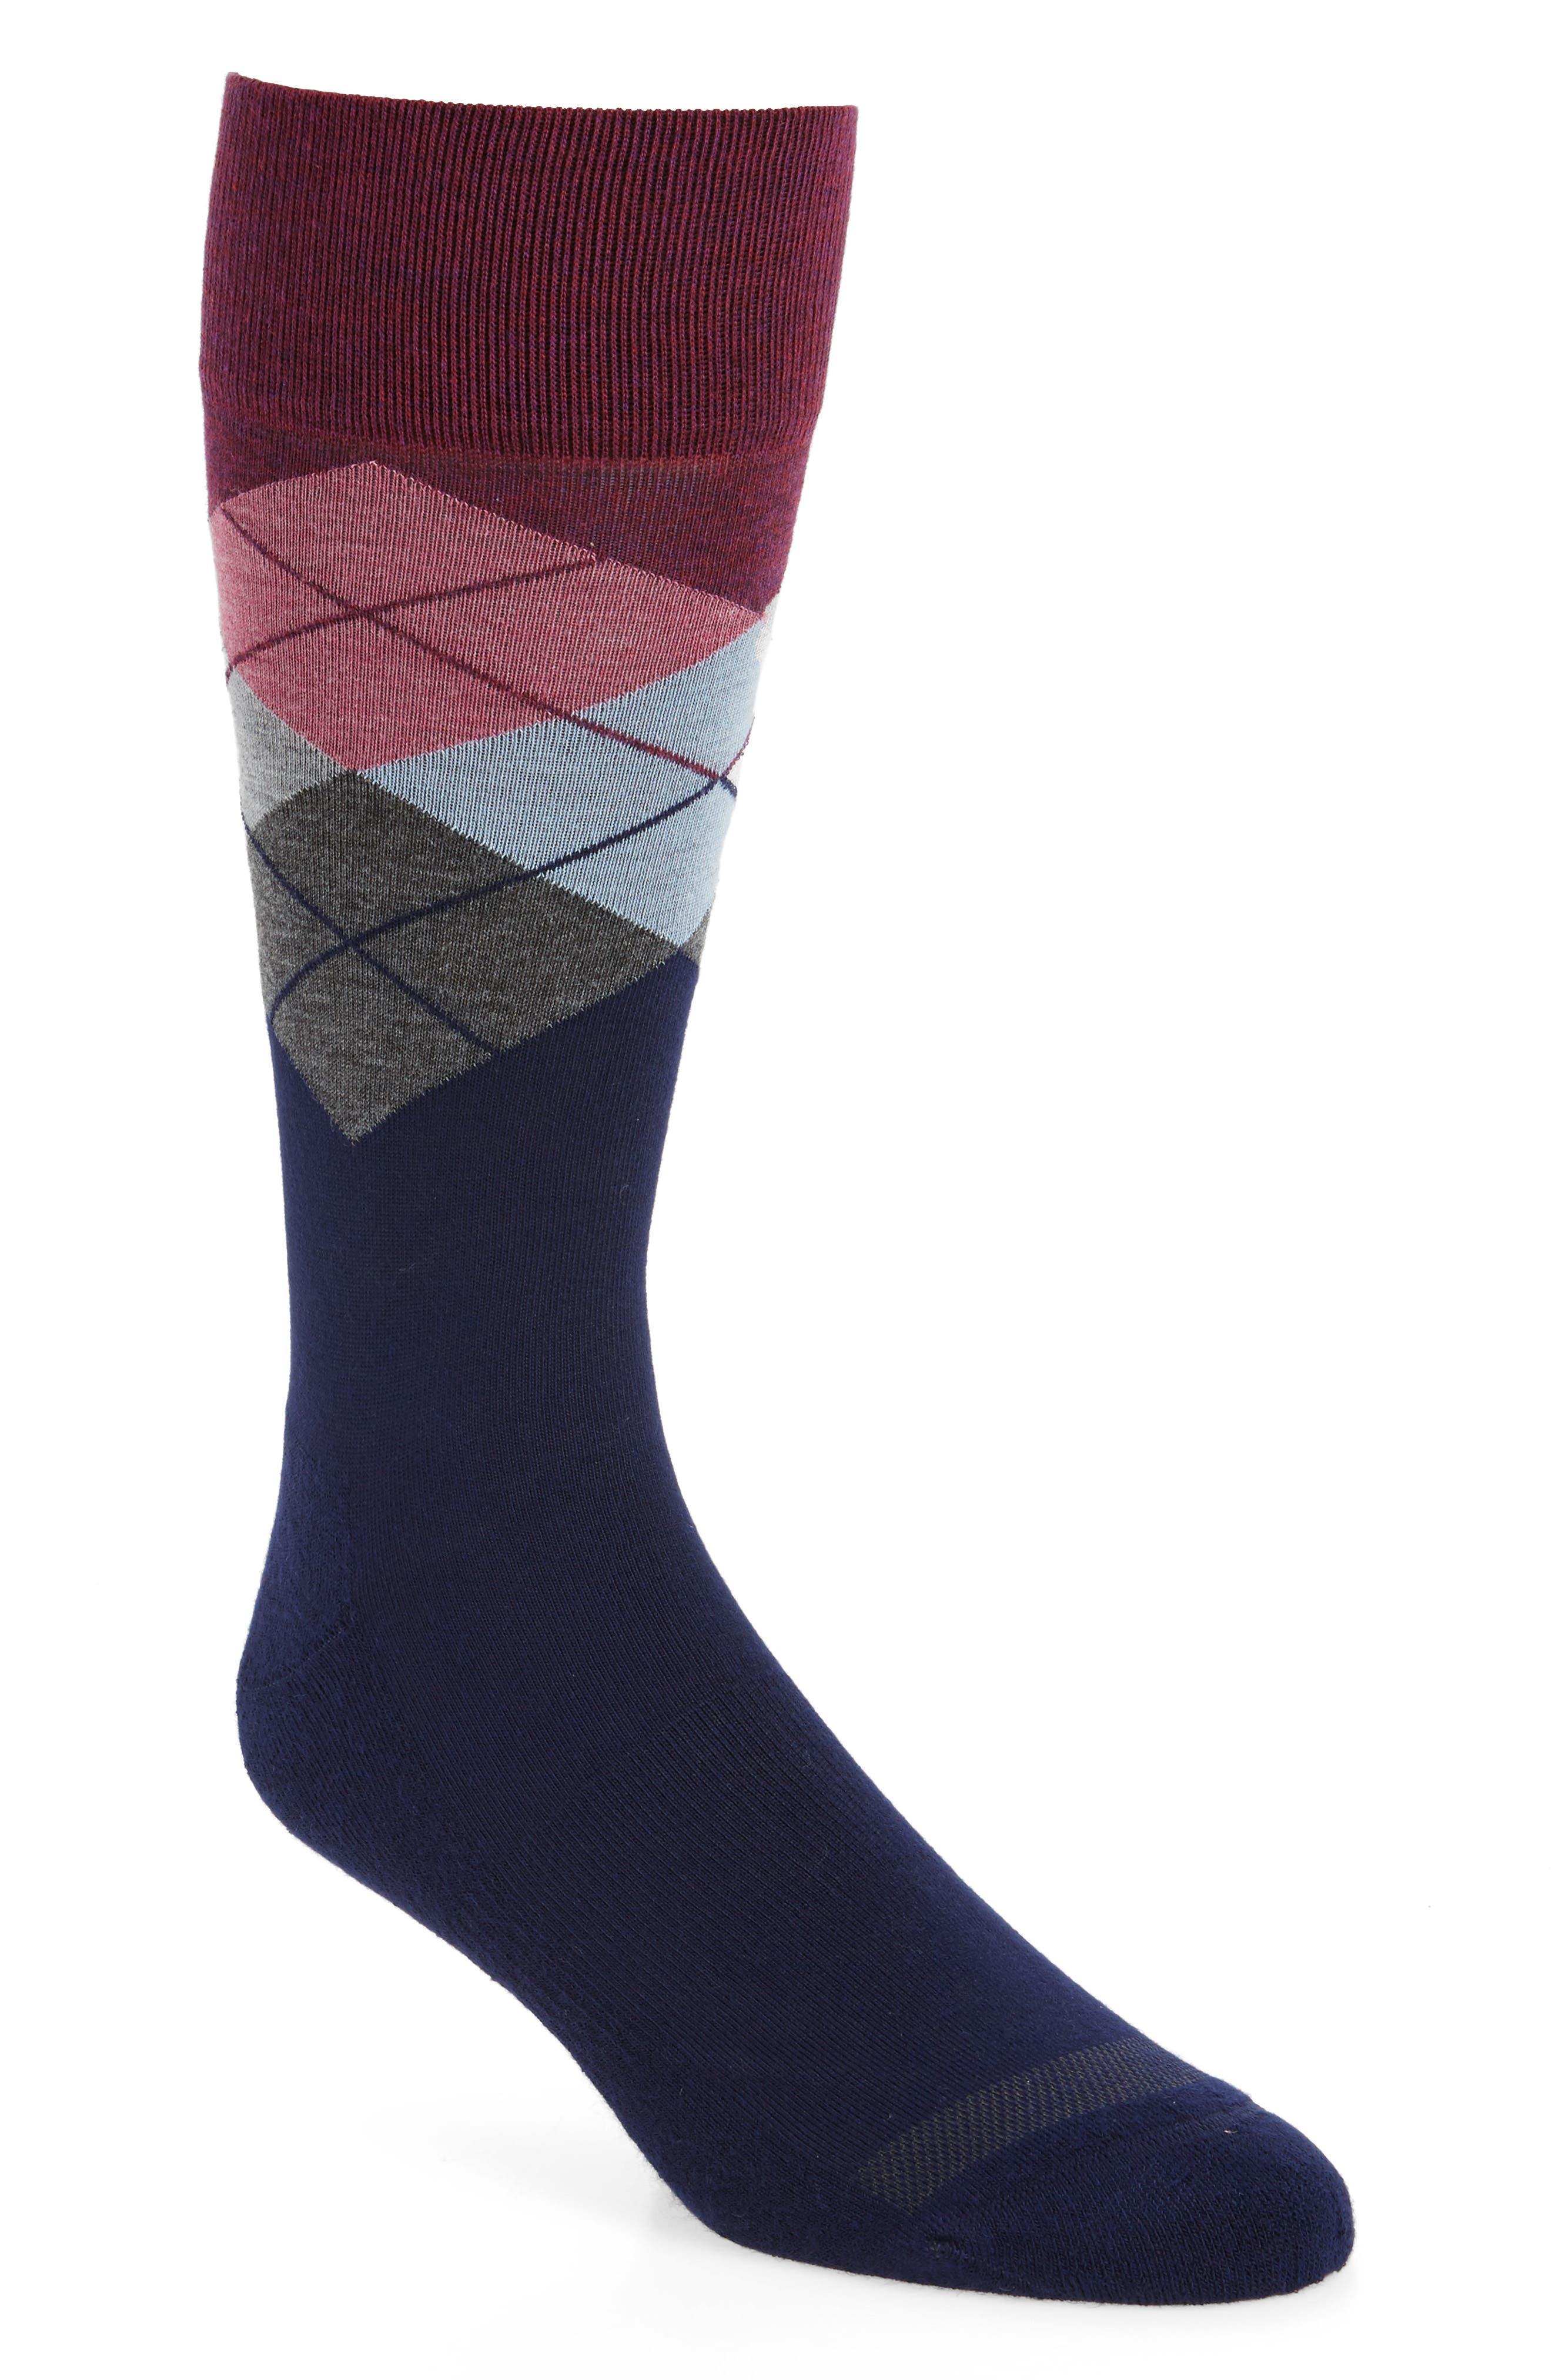 Nordstrom Men's Shop Argyle Socks (3 for $30)